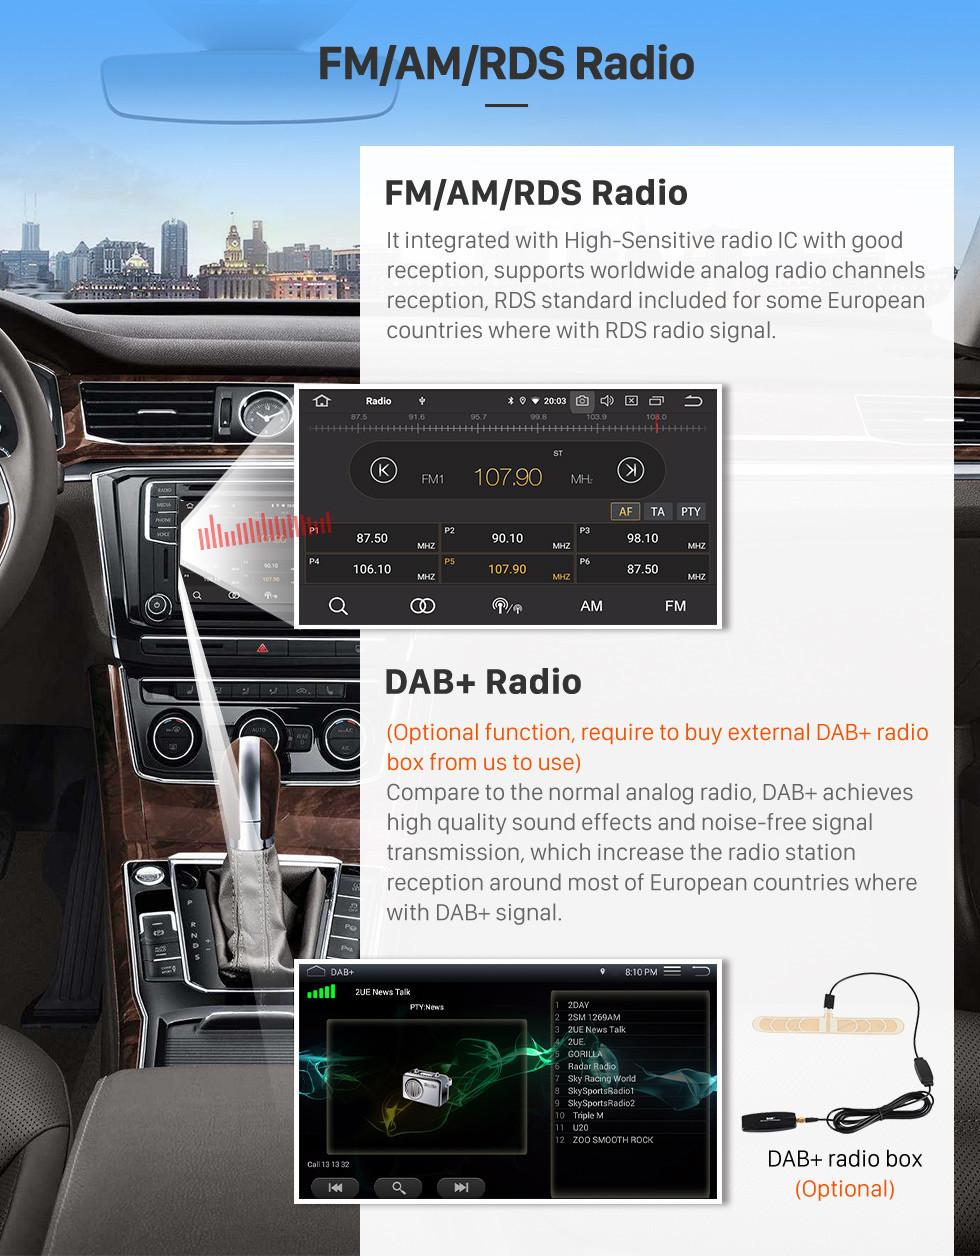 Seicane HD Touchscreen 2015-2017 Proton Myvi Android 10.0 9 inch GPS Navigation Radio Bluetooth WIFI AUX USB Carplay support DAB+ DVR OBD2